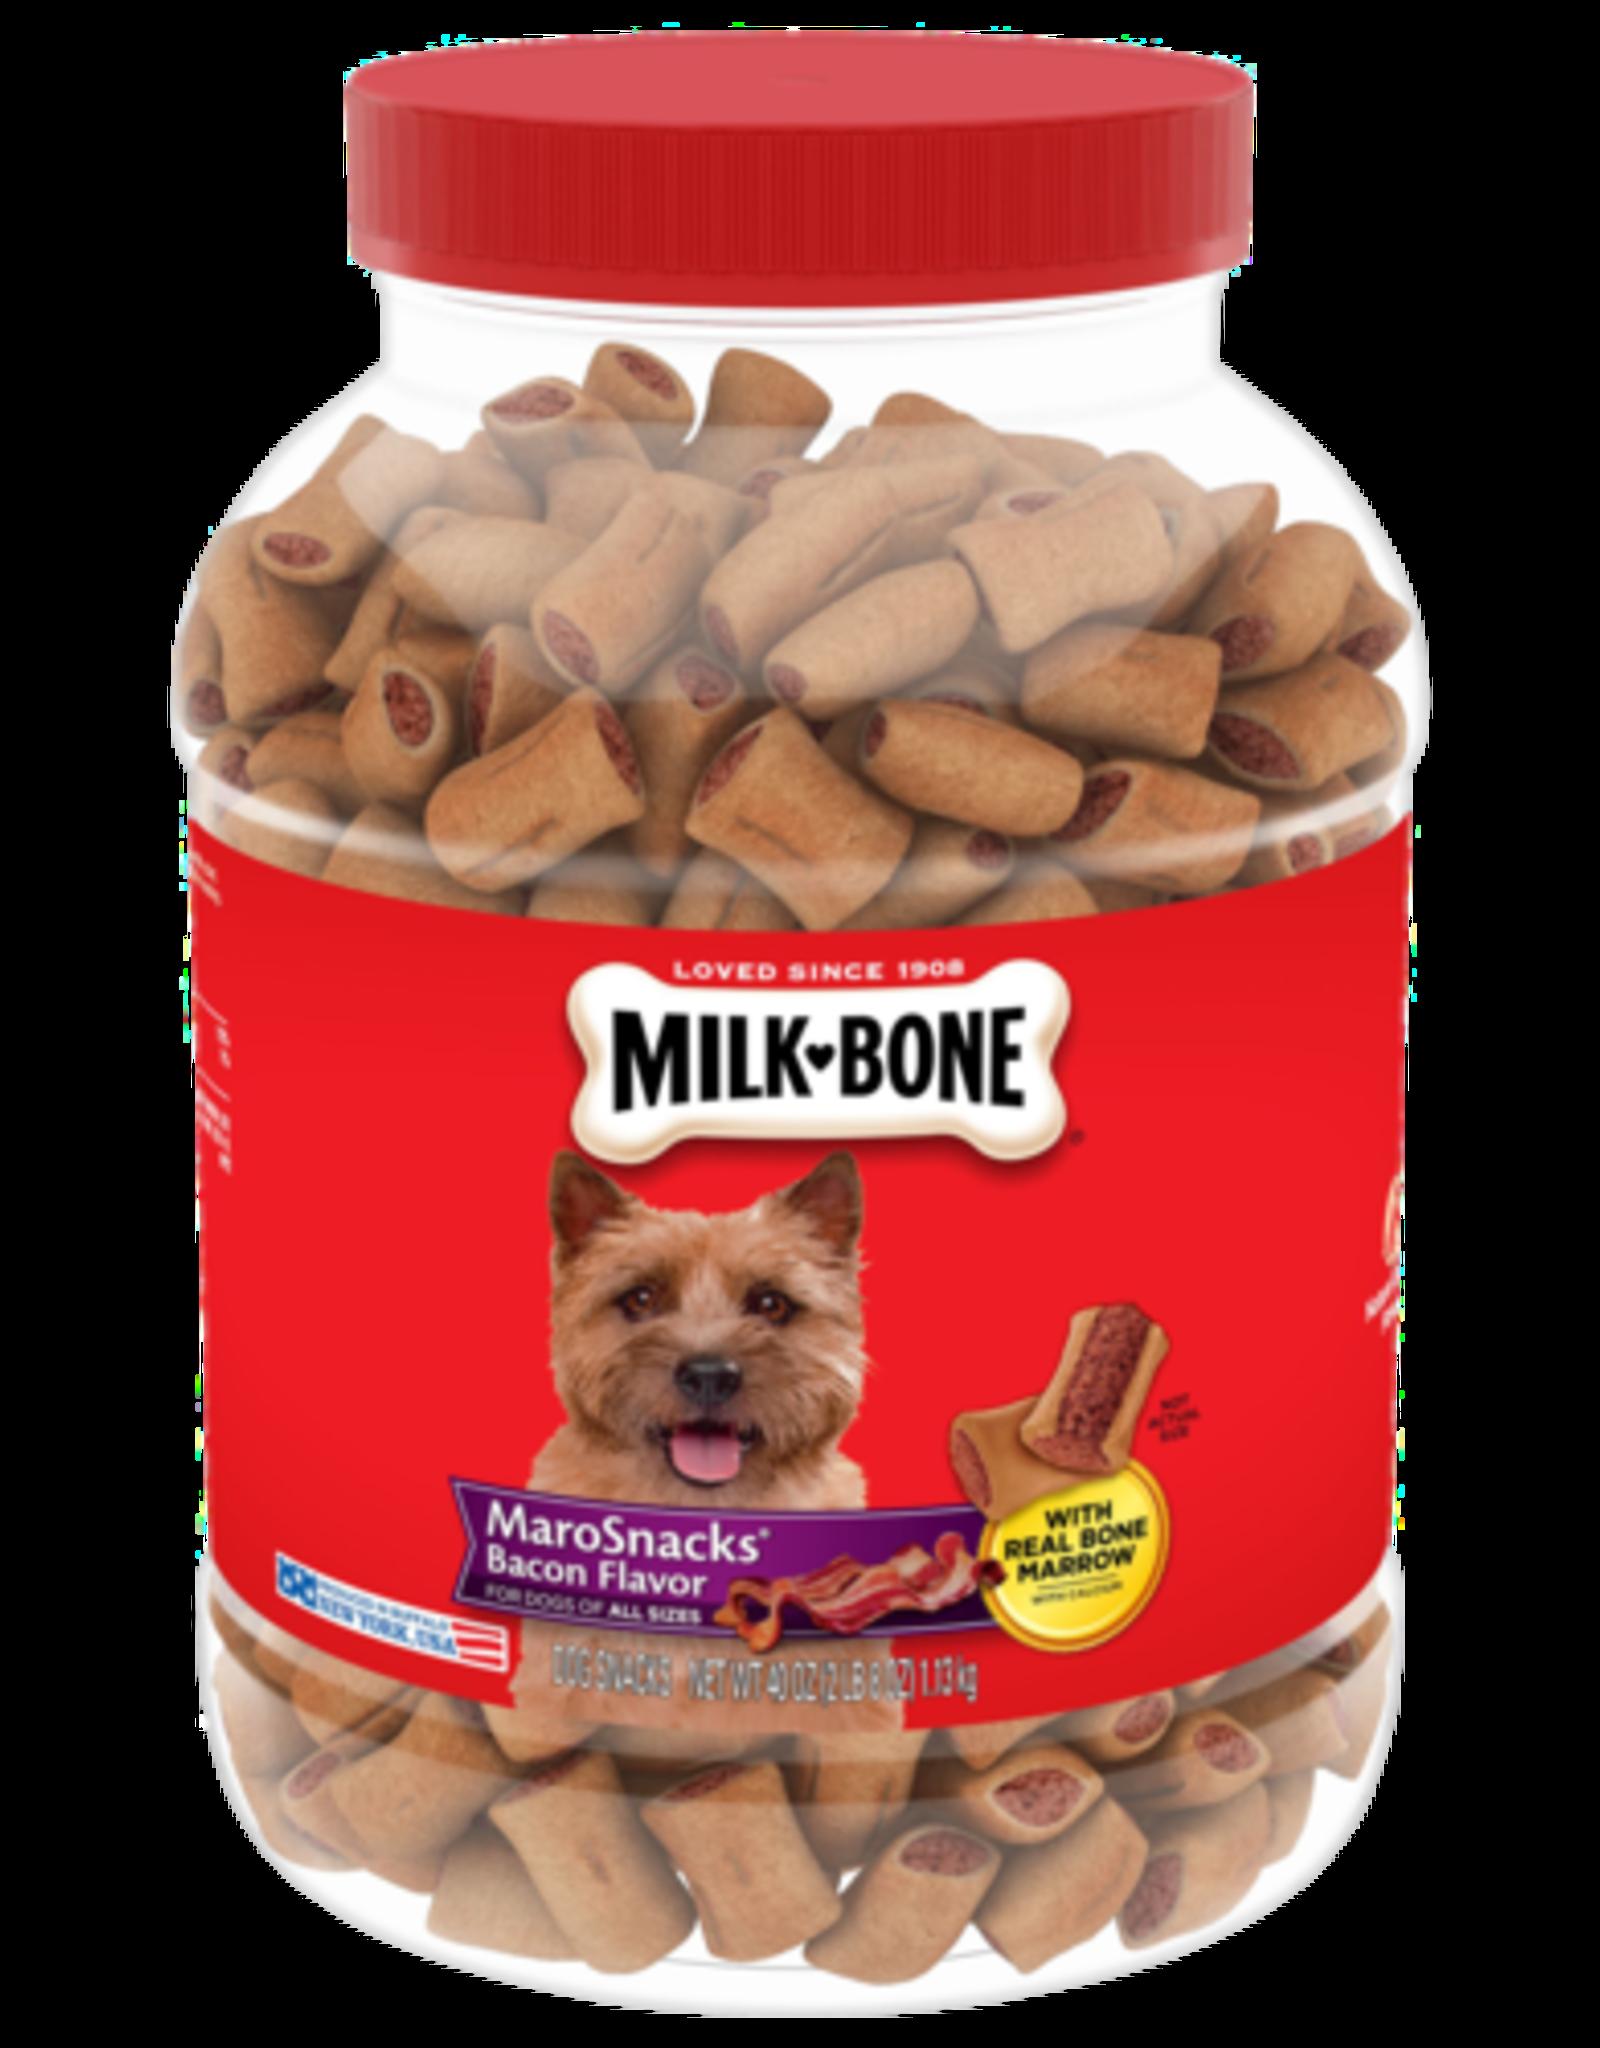 DELMONTE FOODS LLC MILKBONE  MAROSNACKS 15OZ